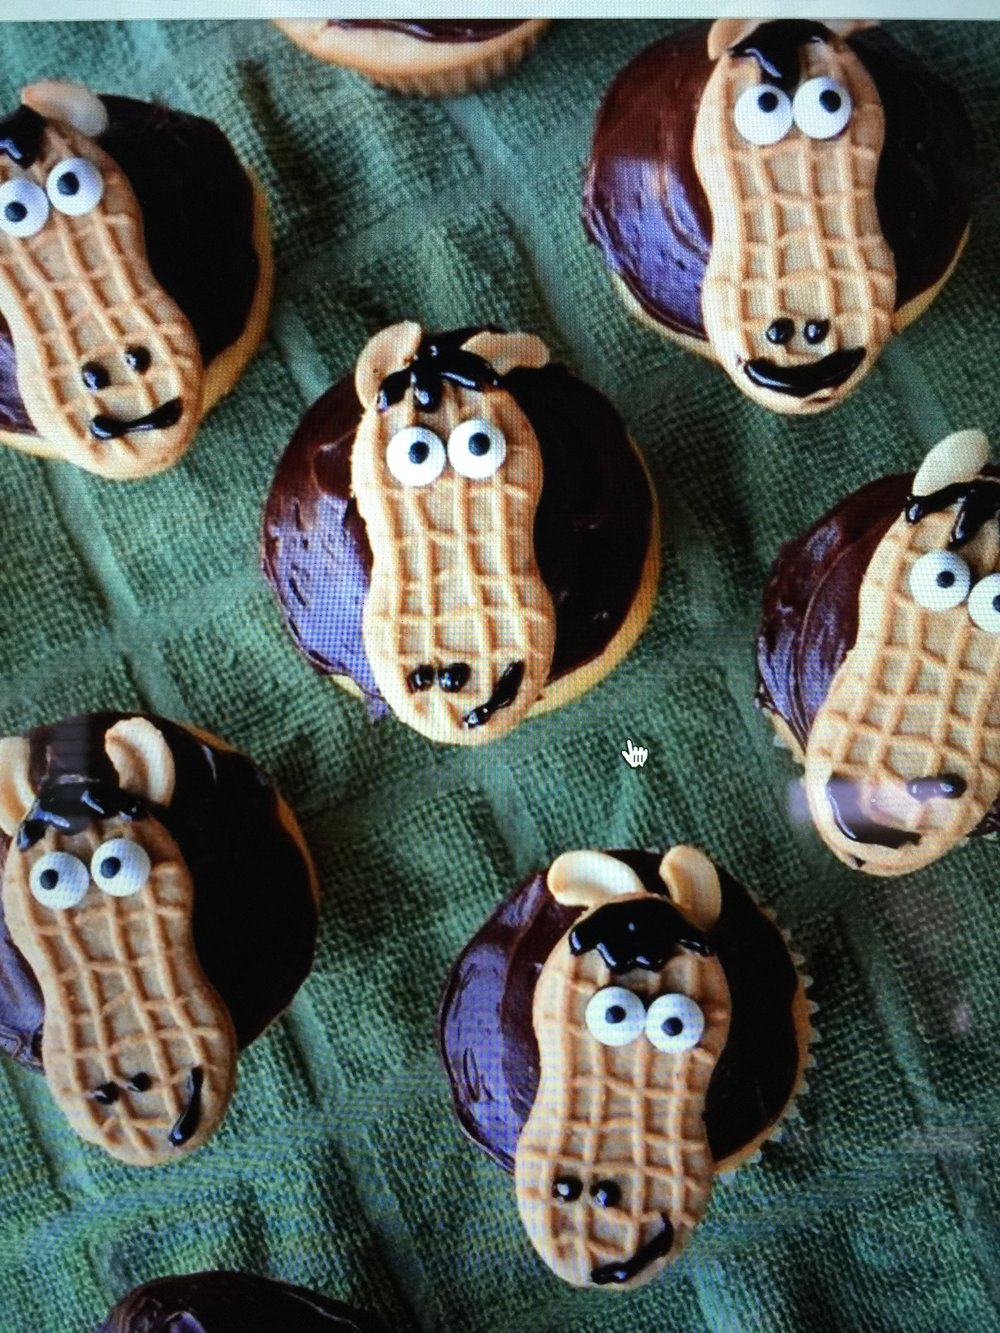 shawna cupcake IMG_0687.JPG